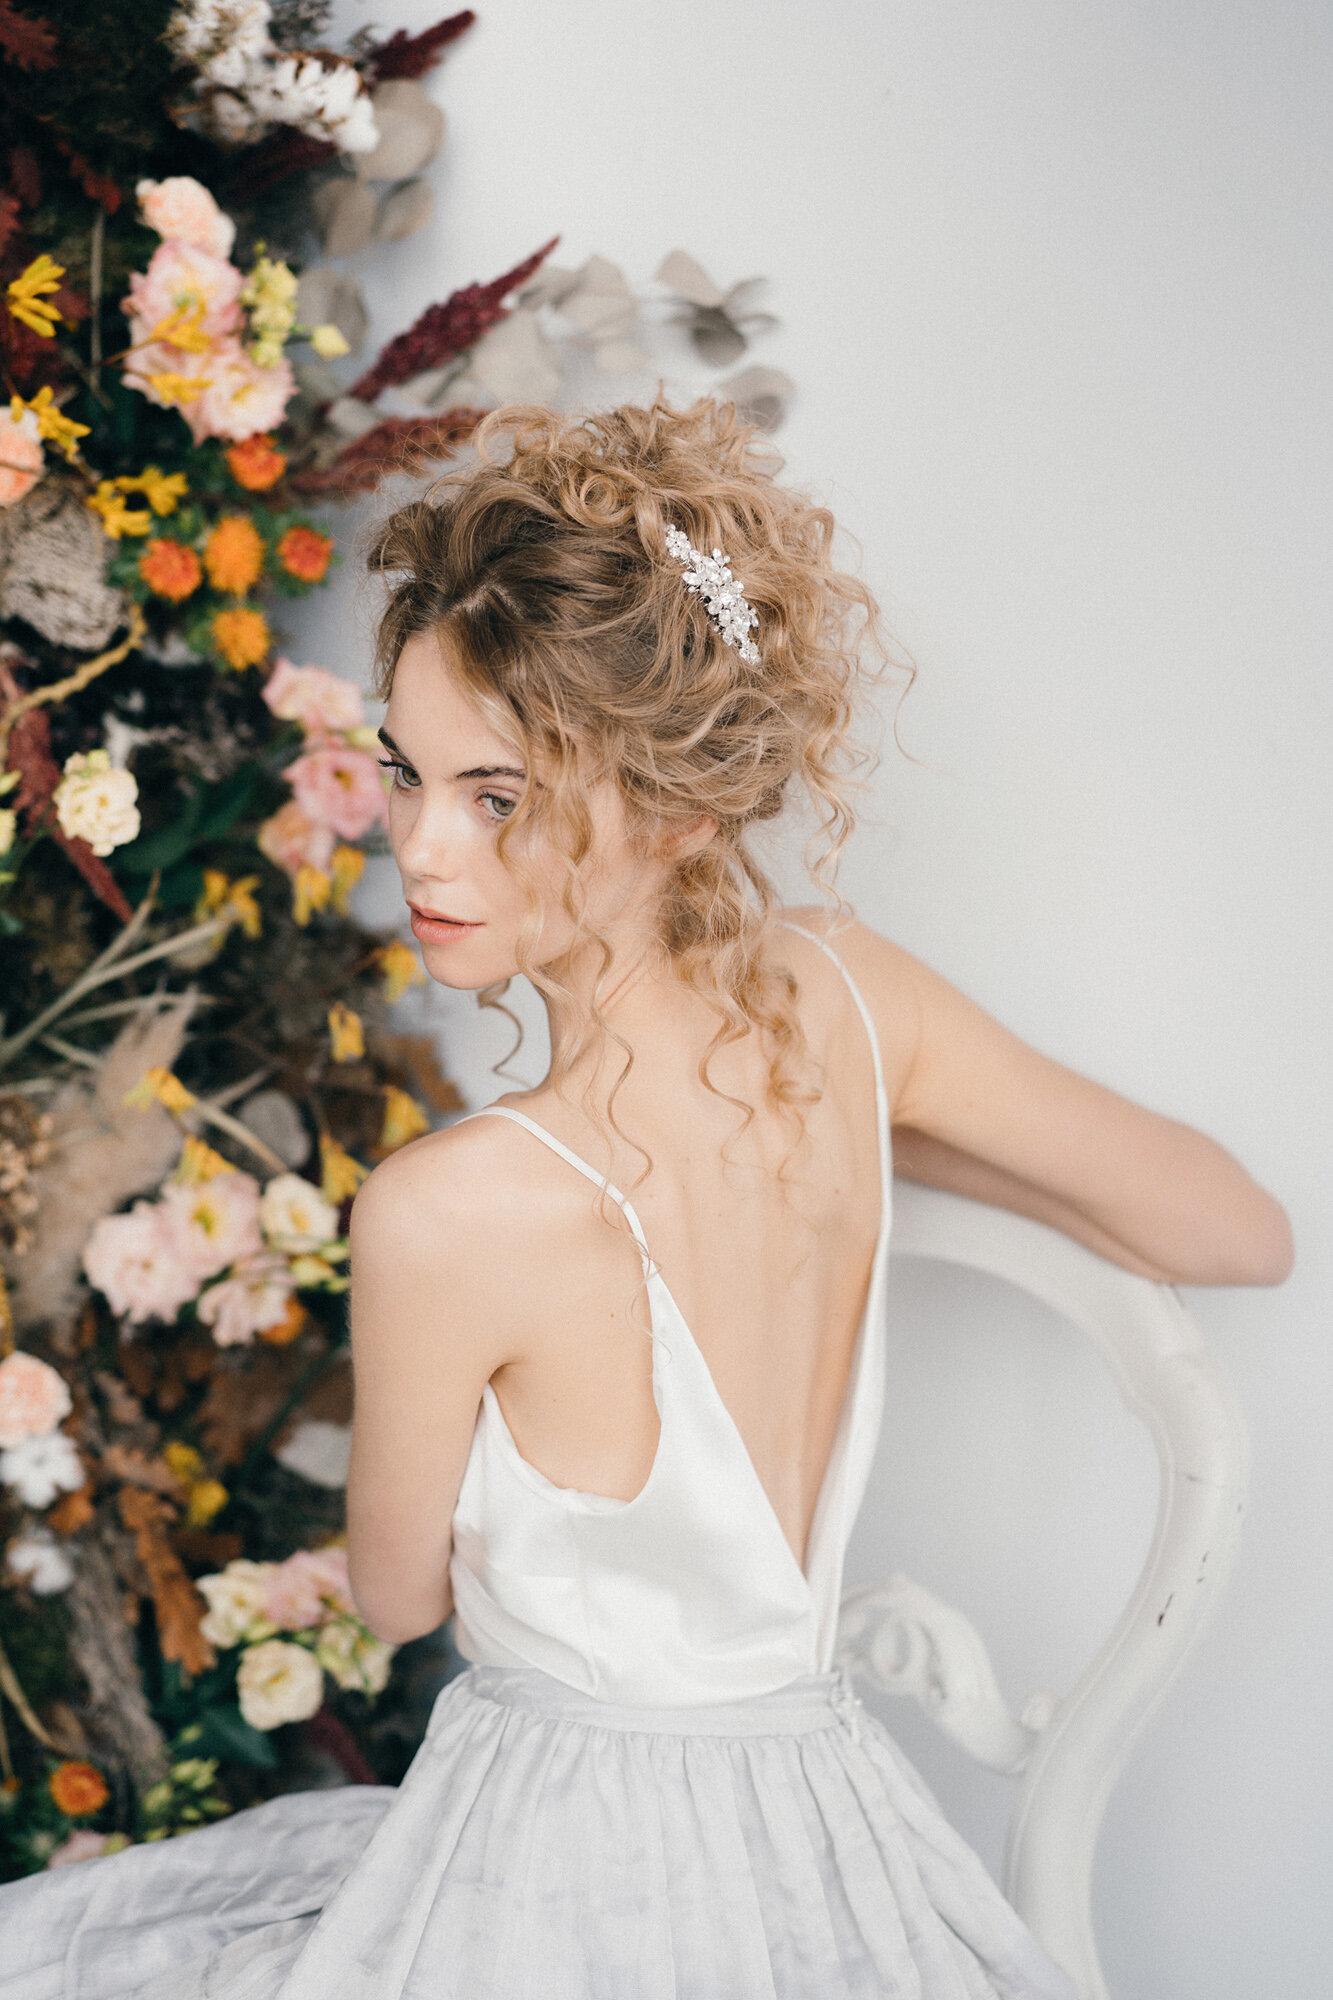 Debbie-Carlisle-Bridal-Accessories-Kate-Beaumont-Wedding-Gowns-Sheffield-Yorkshire-UK-27.jpg